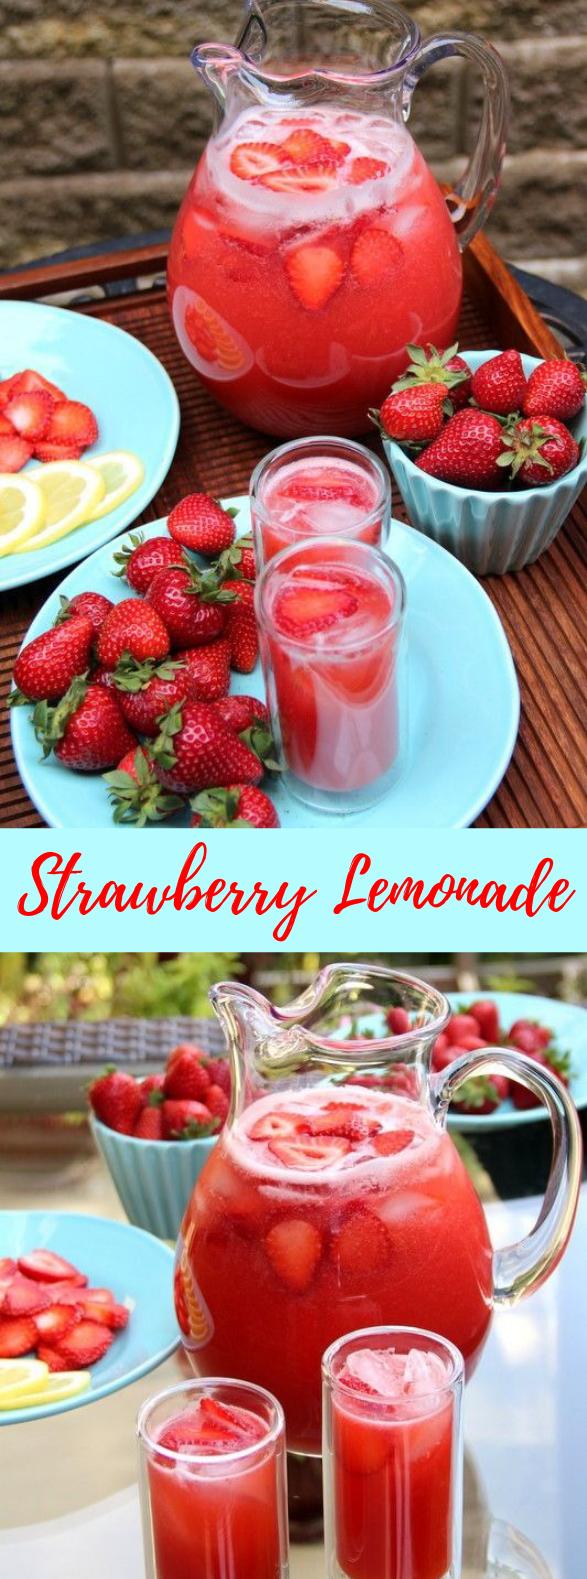 Strawberry lemonade #Homemade #Drink